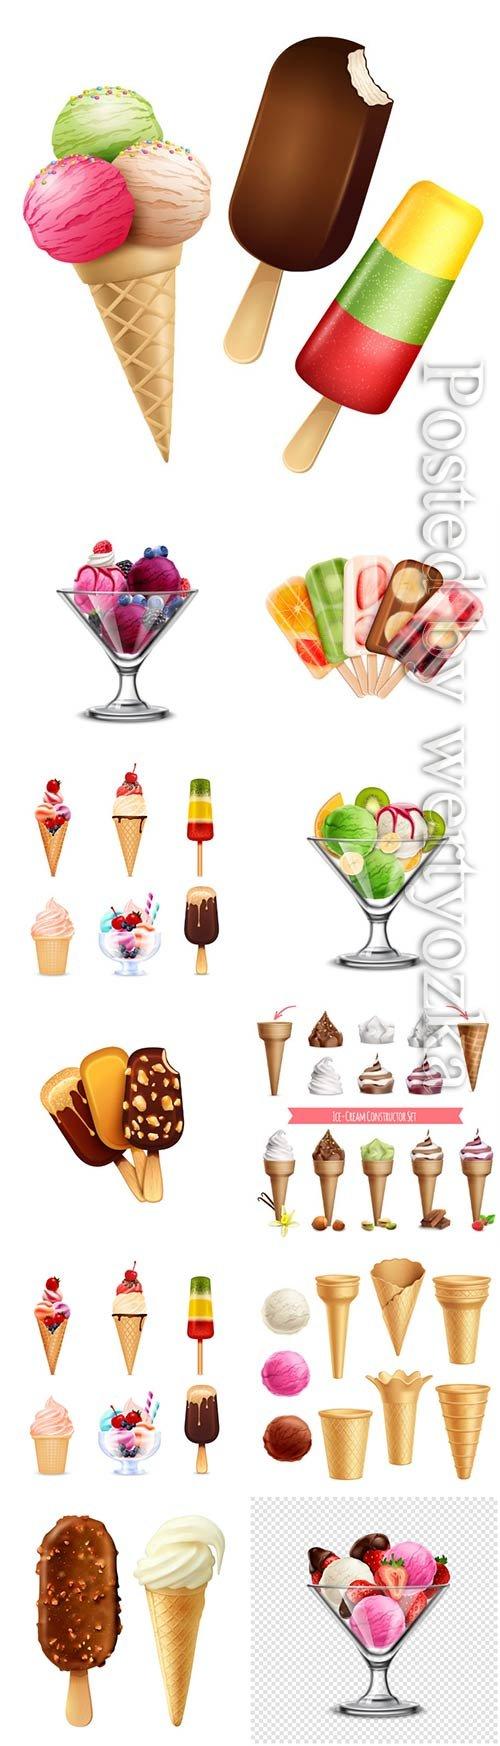 Ice cream platter, chocolate and vanilla ice cream with berries in vector